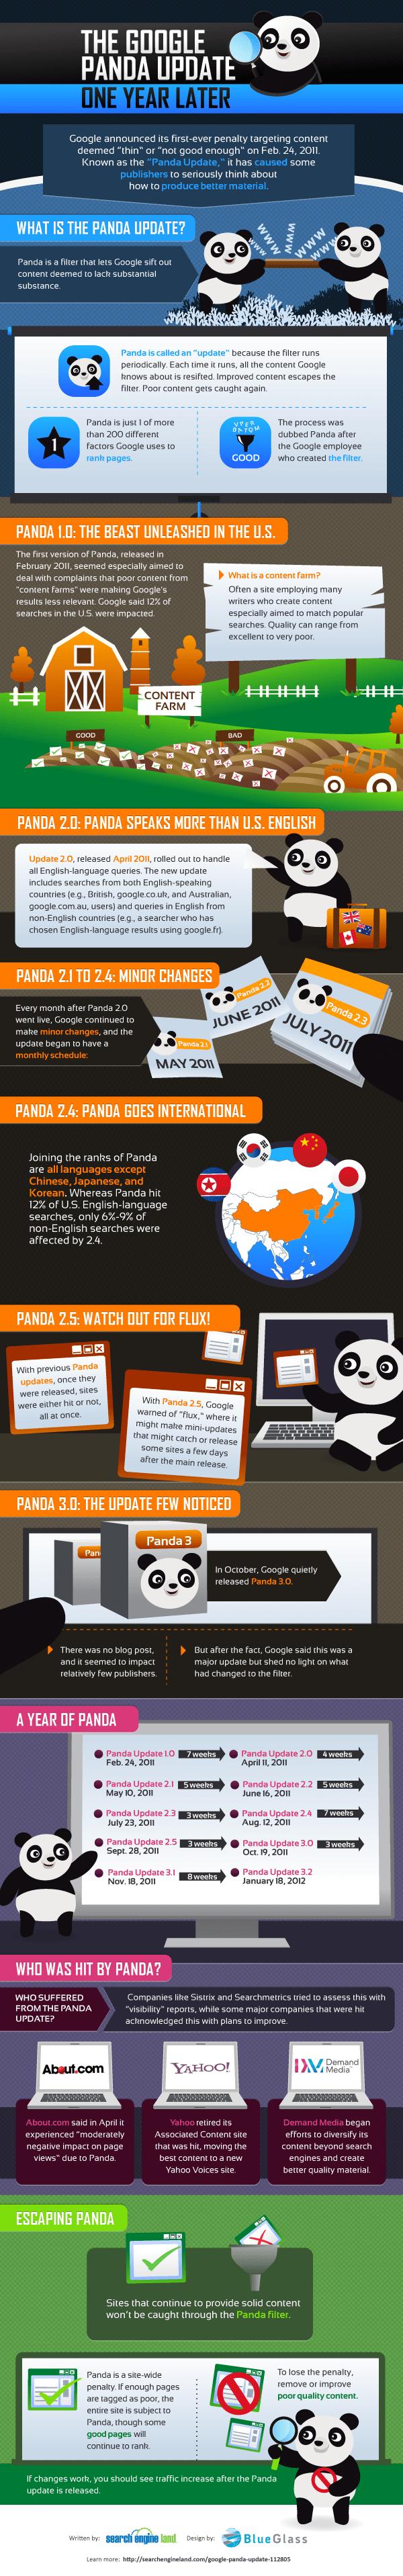 SEO Google Panda Infographic